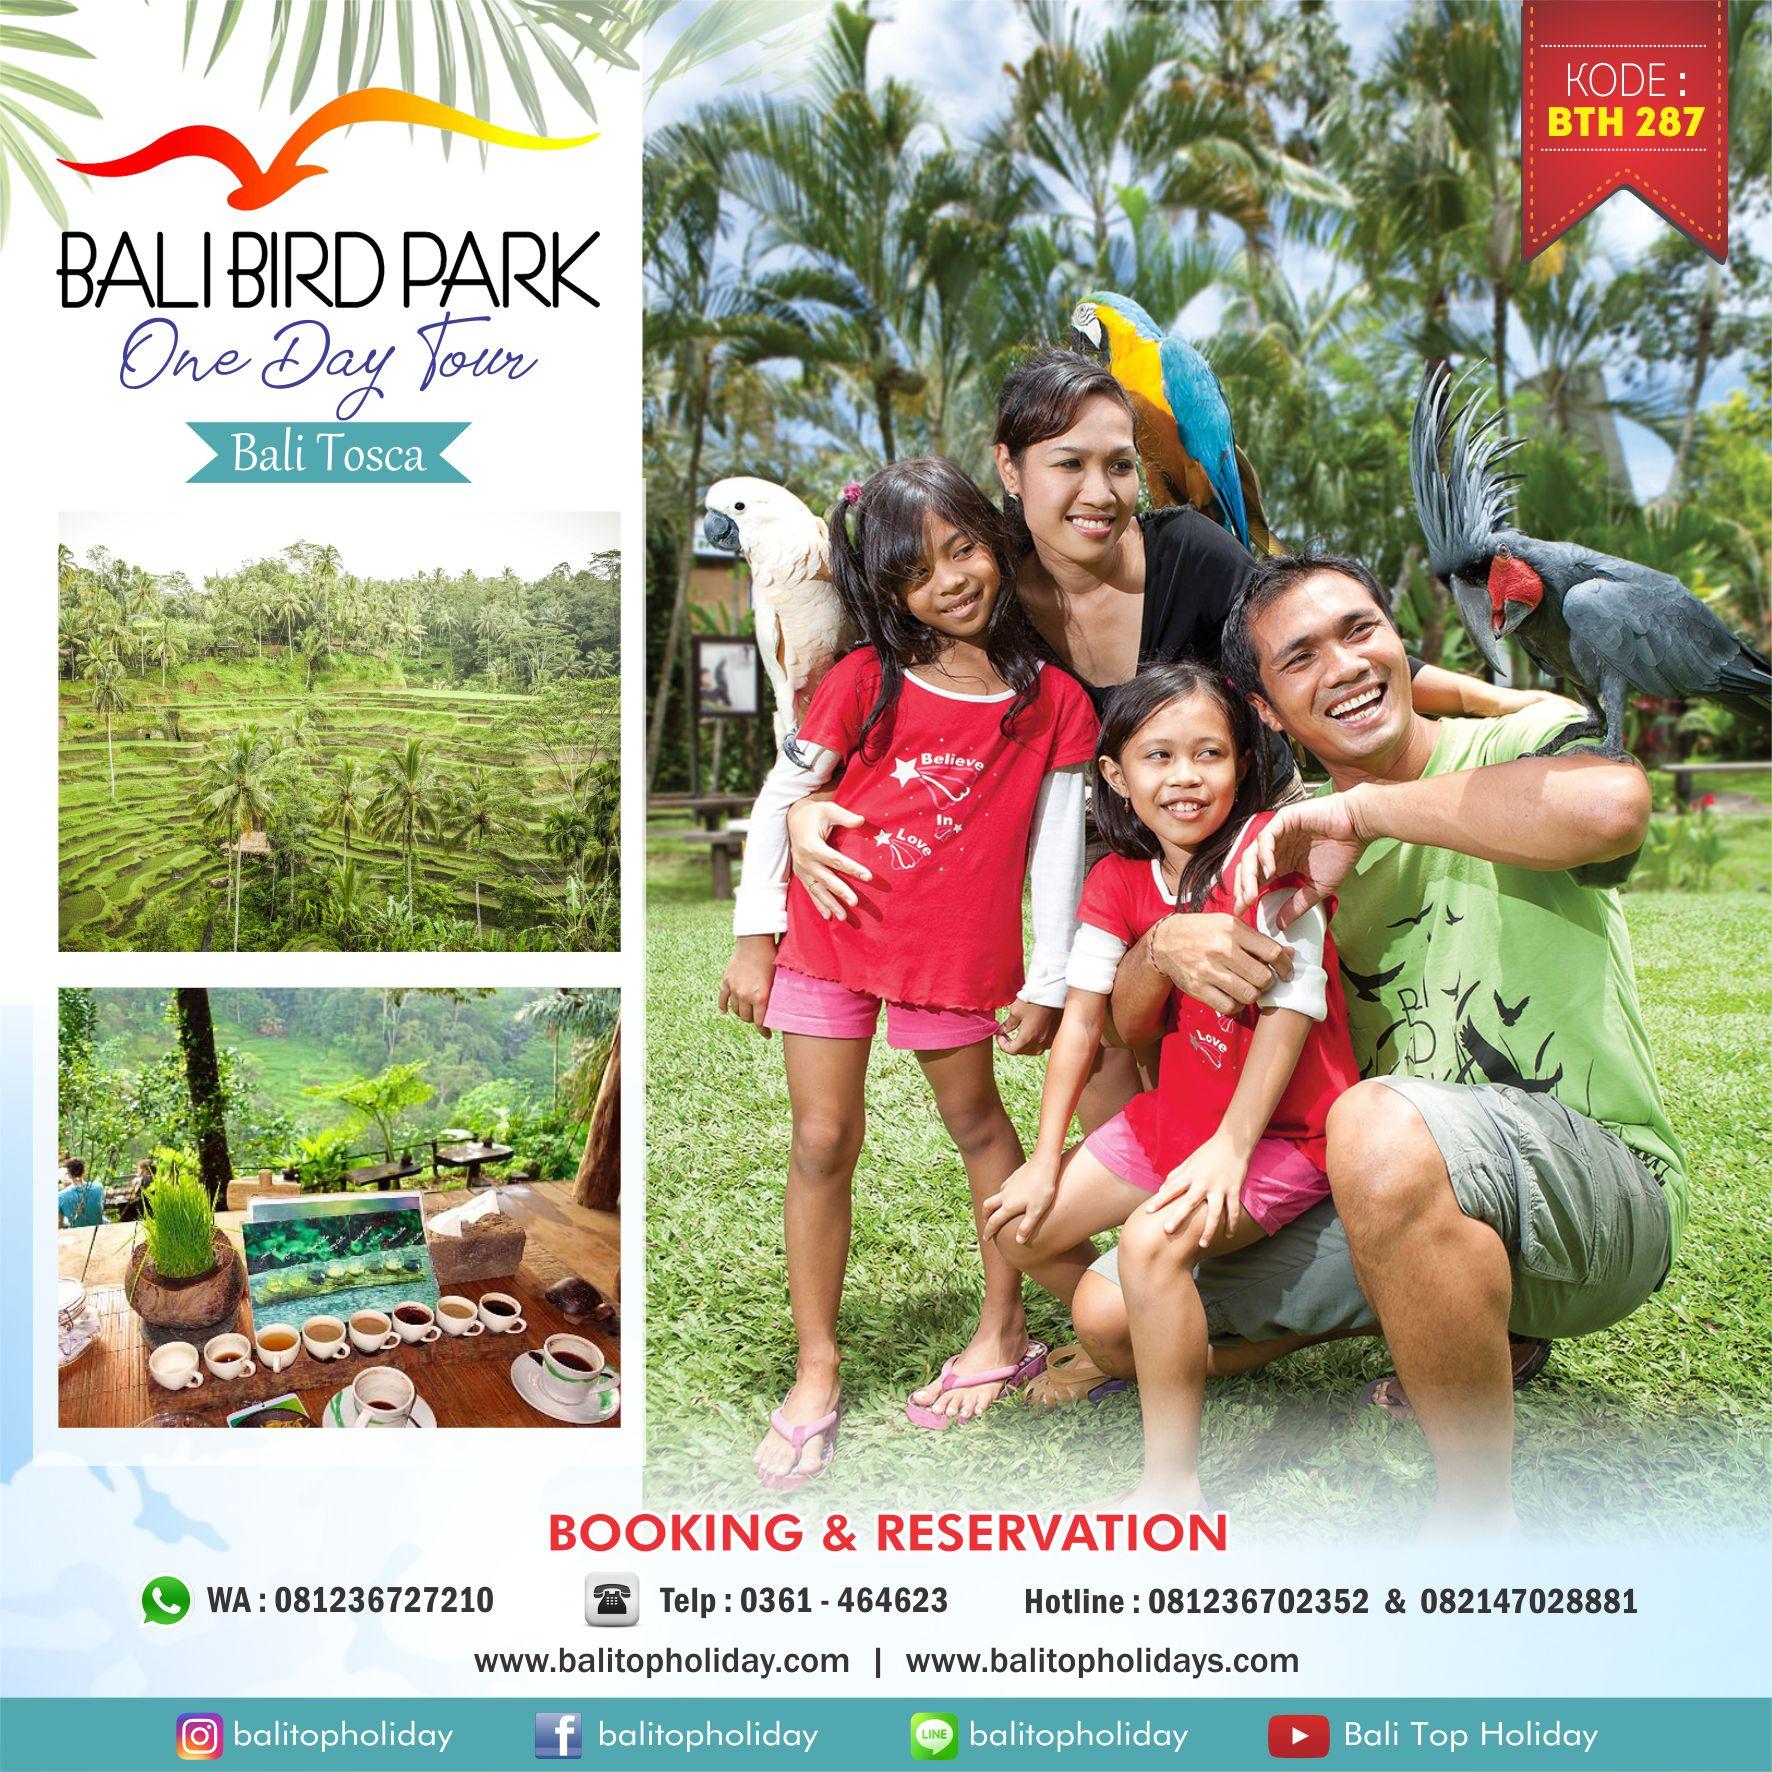 Paket Tour Bali Bird Park